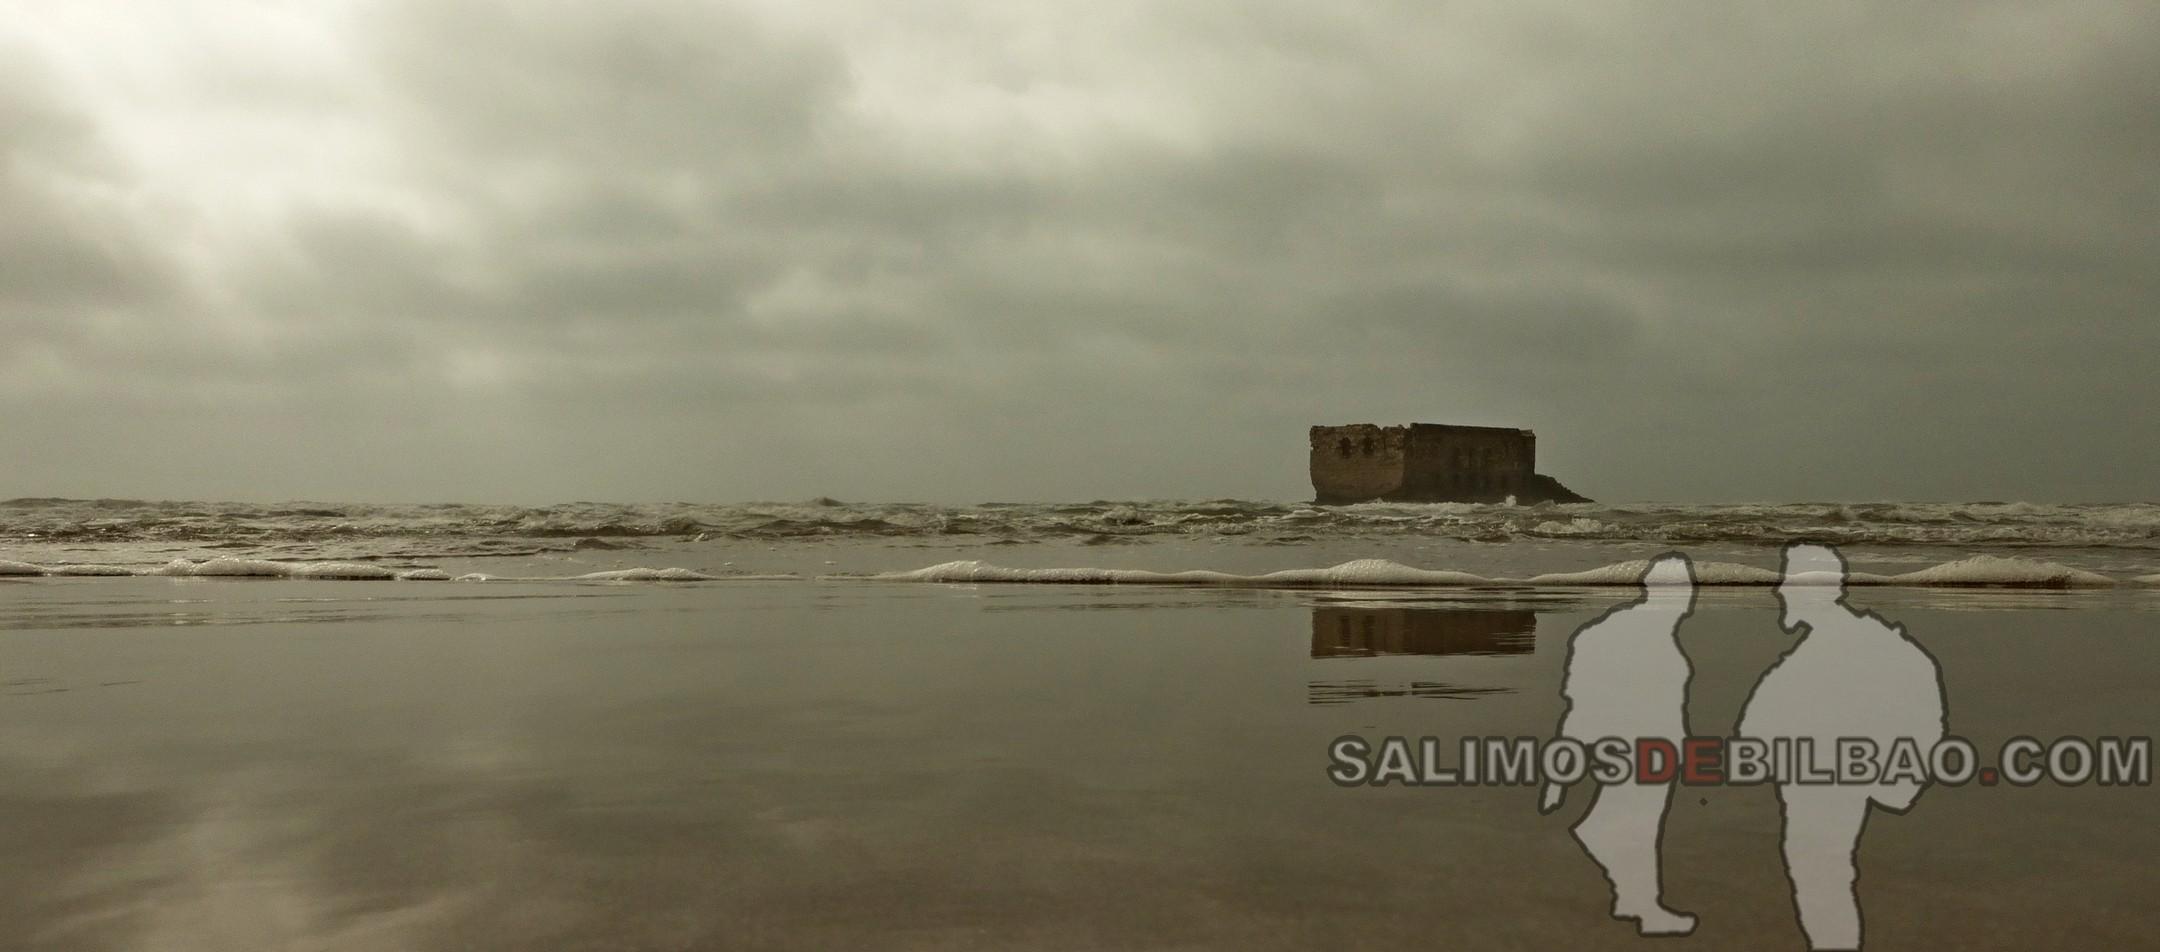 278. Playa de Tarfaya